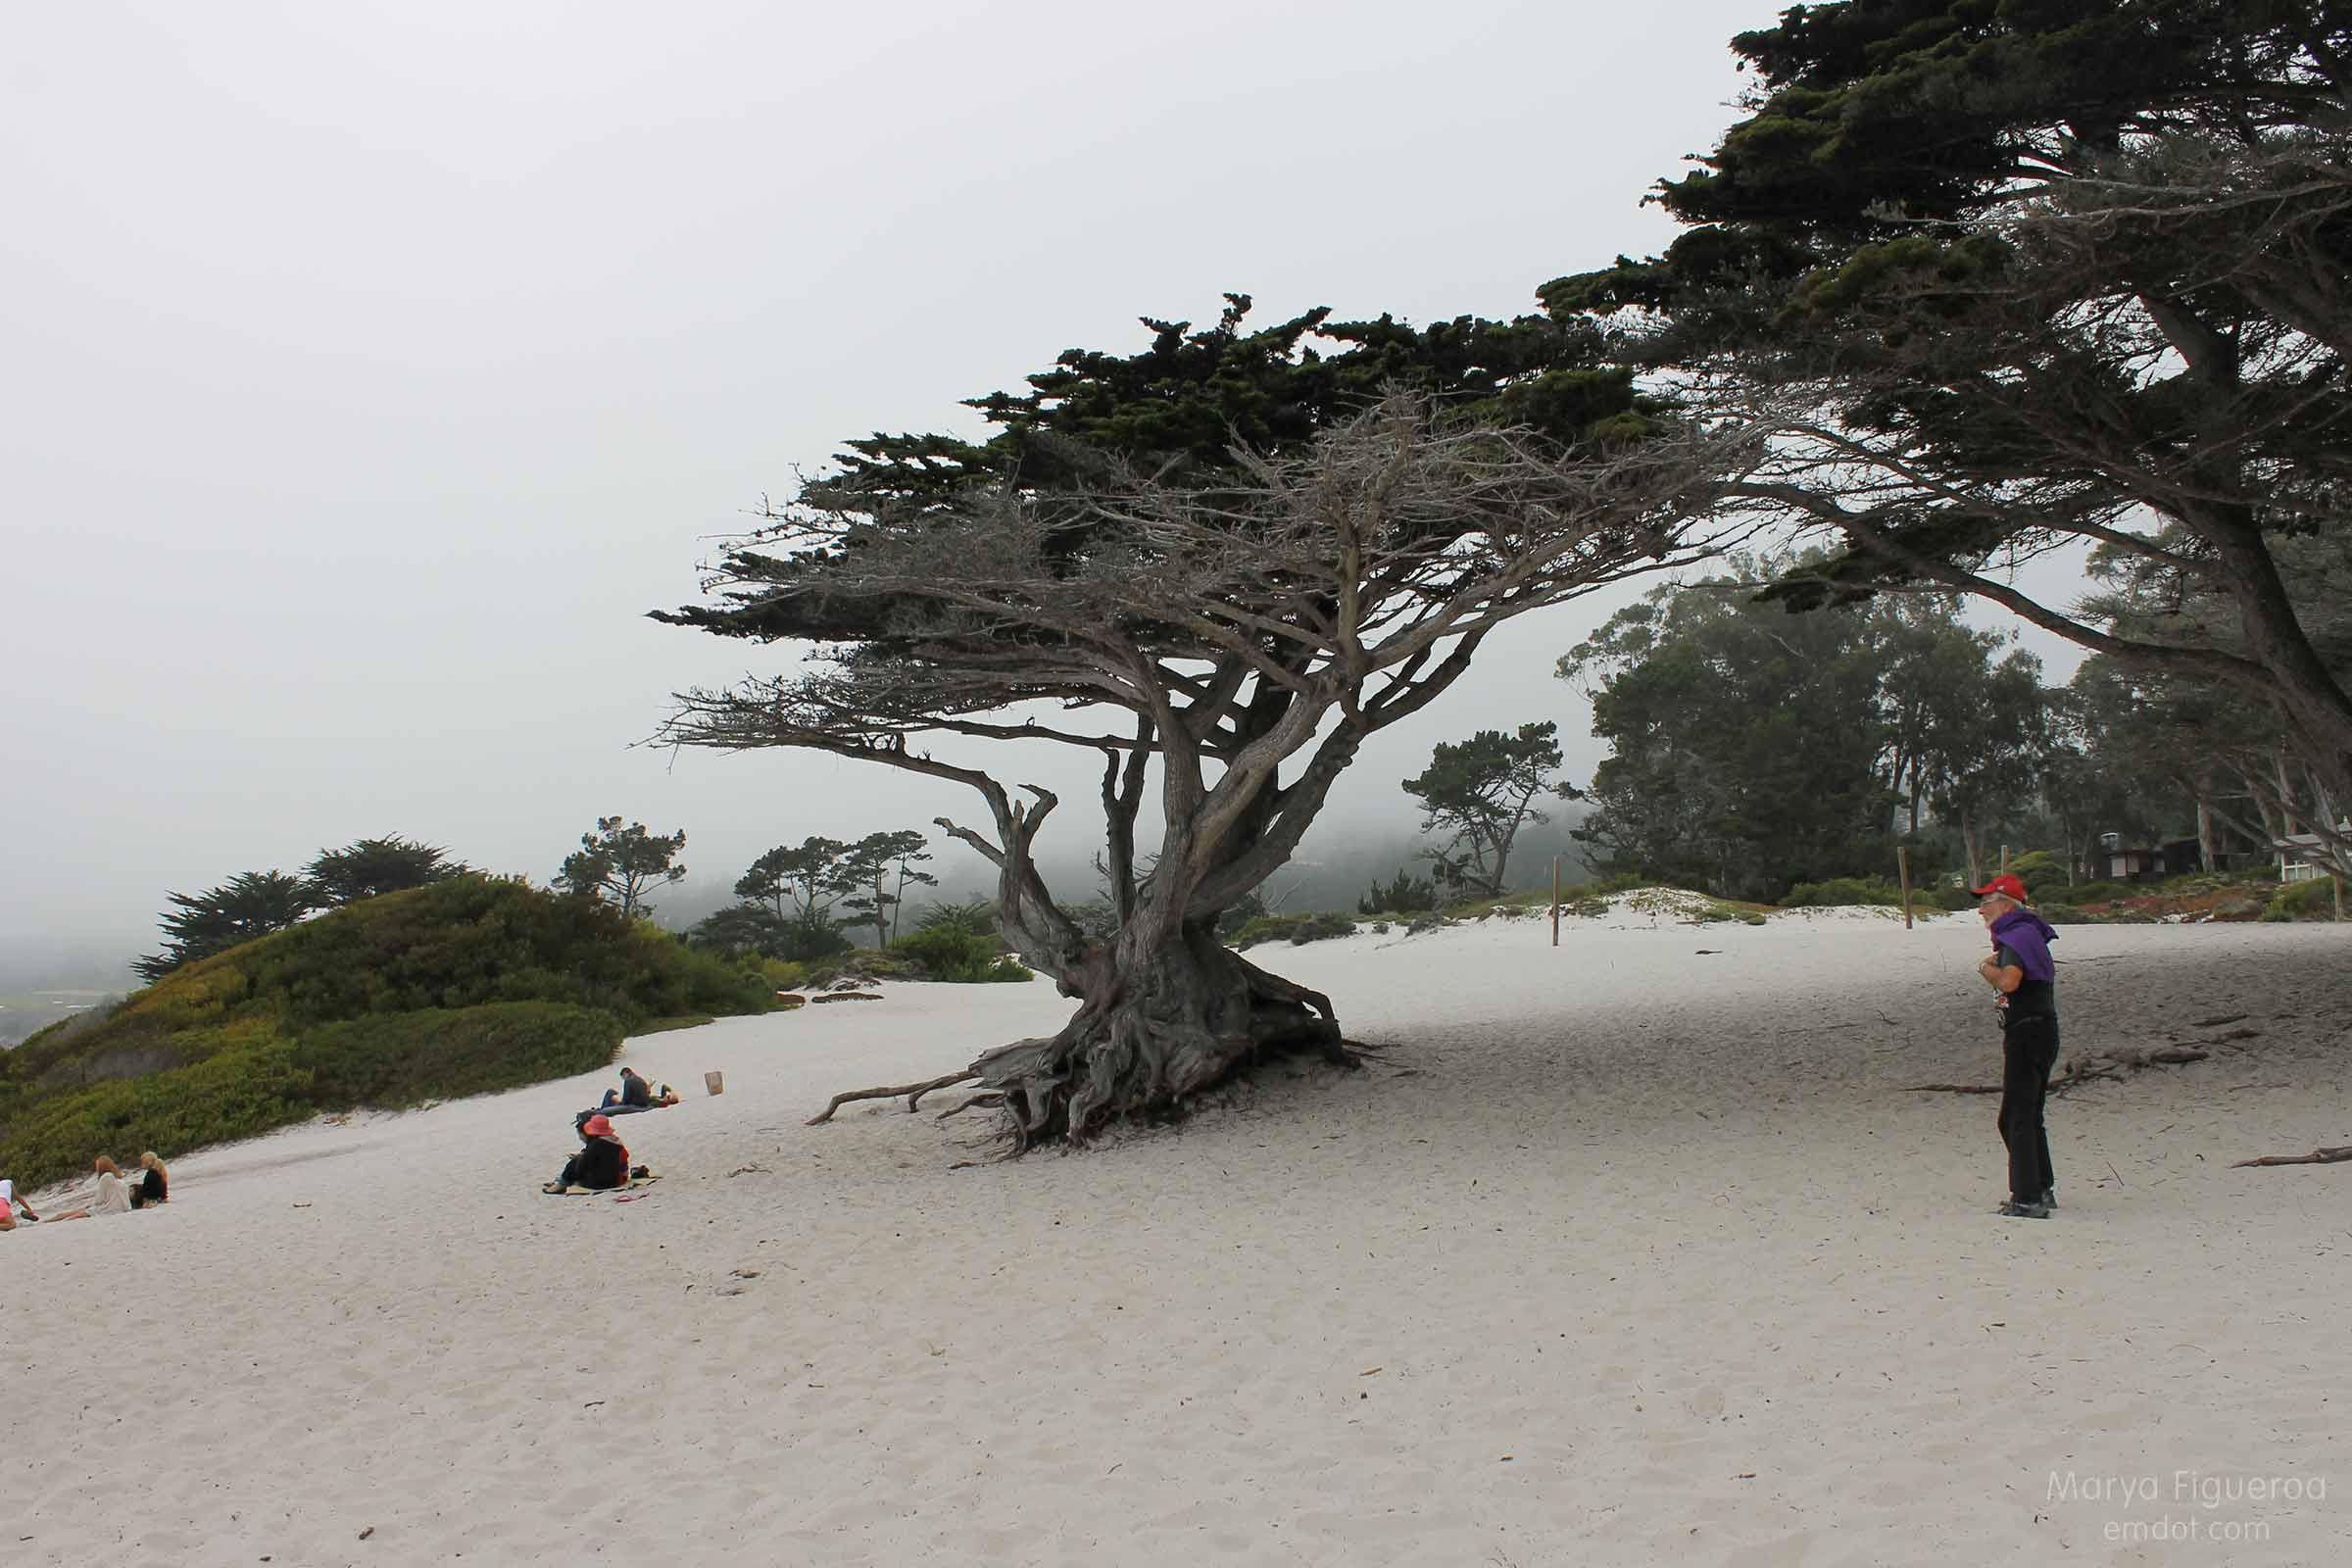 Monterey Cyprus, smaller